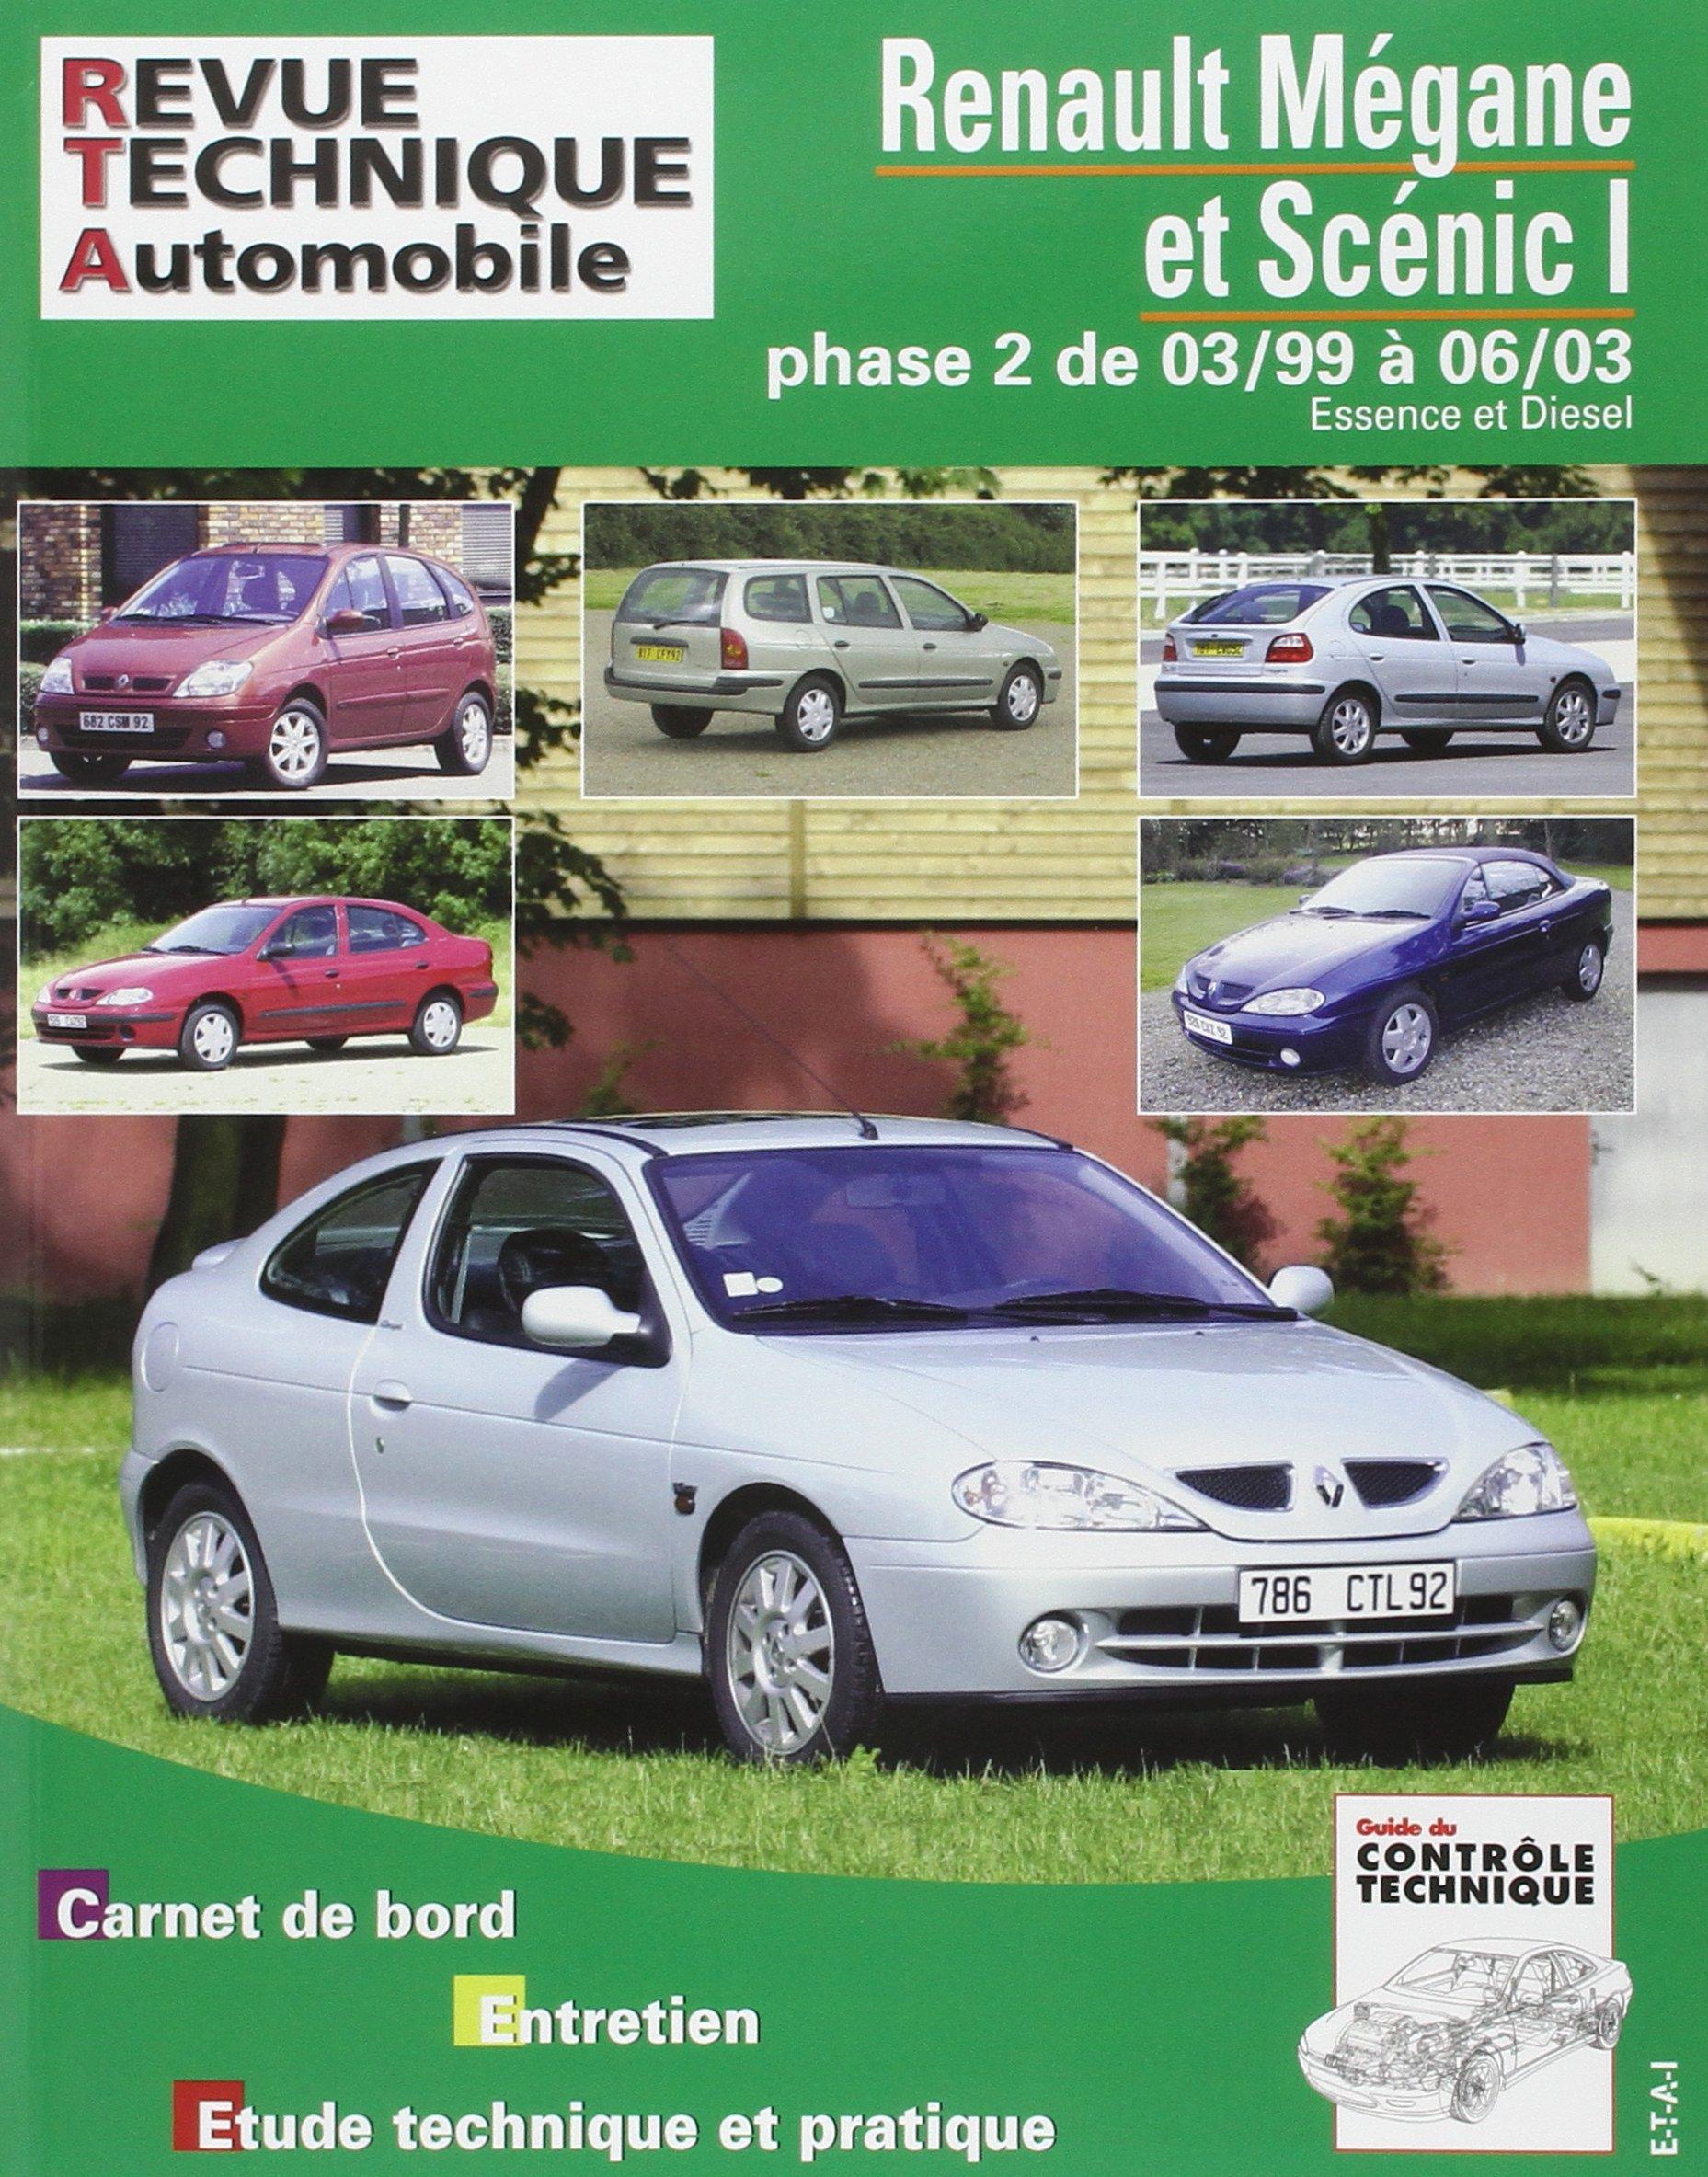 Rta 120.1 Renault Megane/Scenic Es./Die Jusqua 2003: Amazon.es: Etai: Libros en idiomas extranjeros